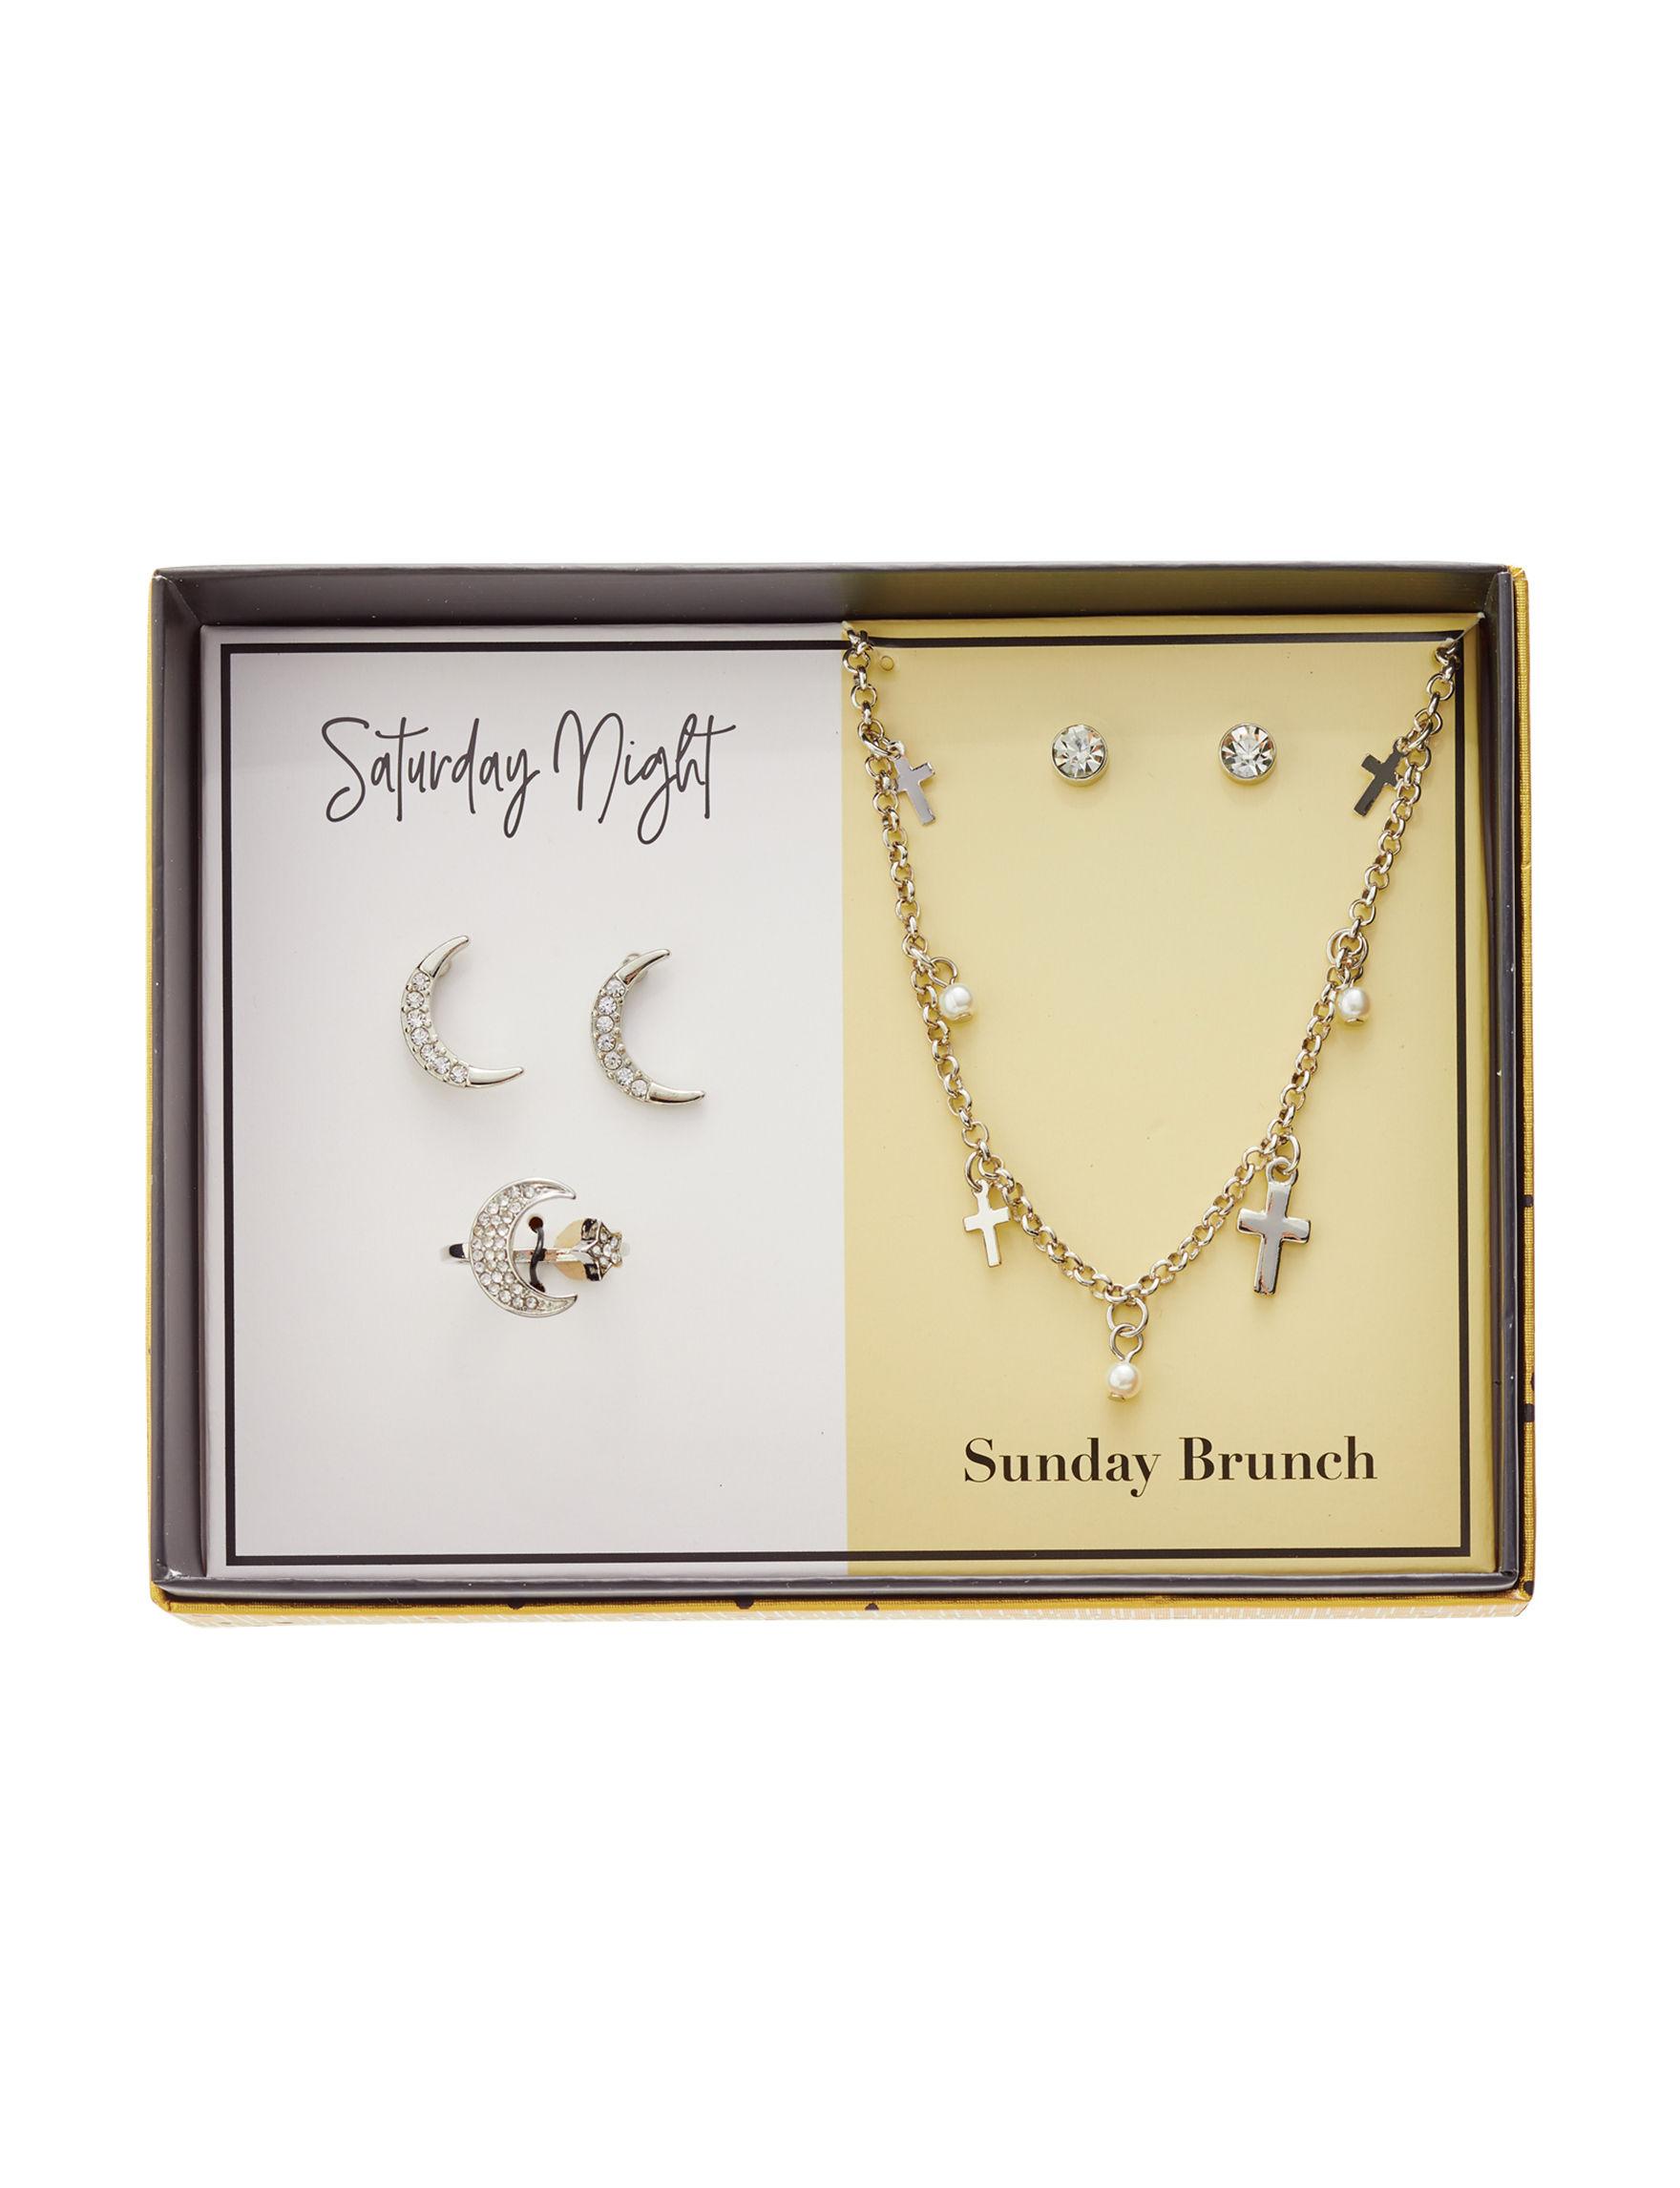 Tanya Crystal Jewelry Sets Fashion Jewelry